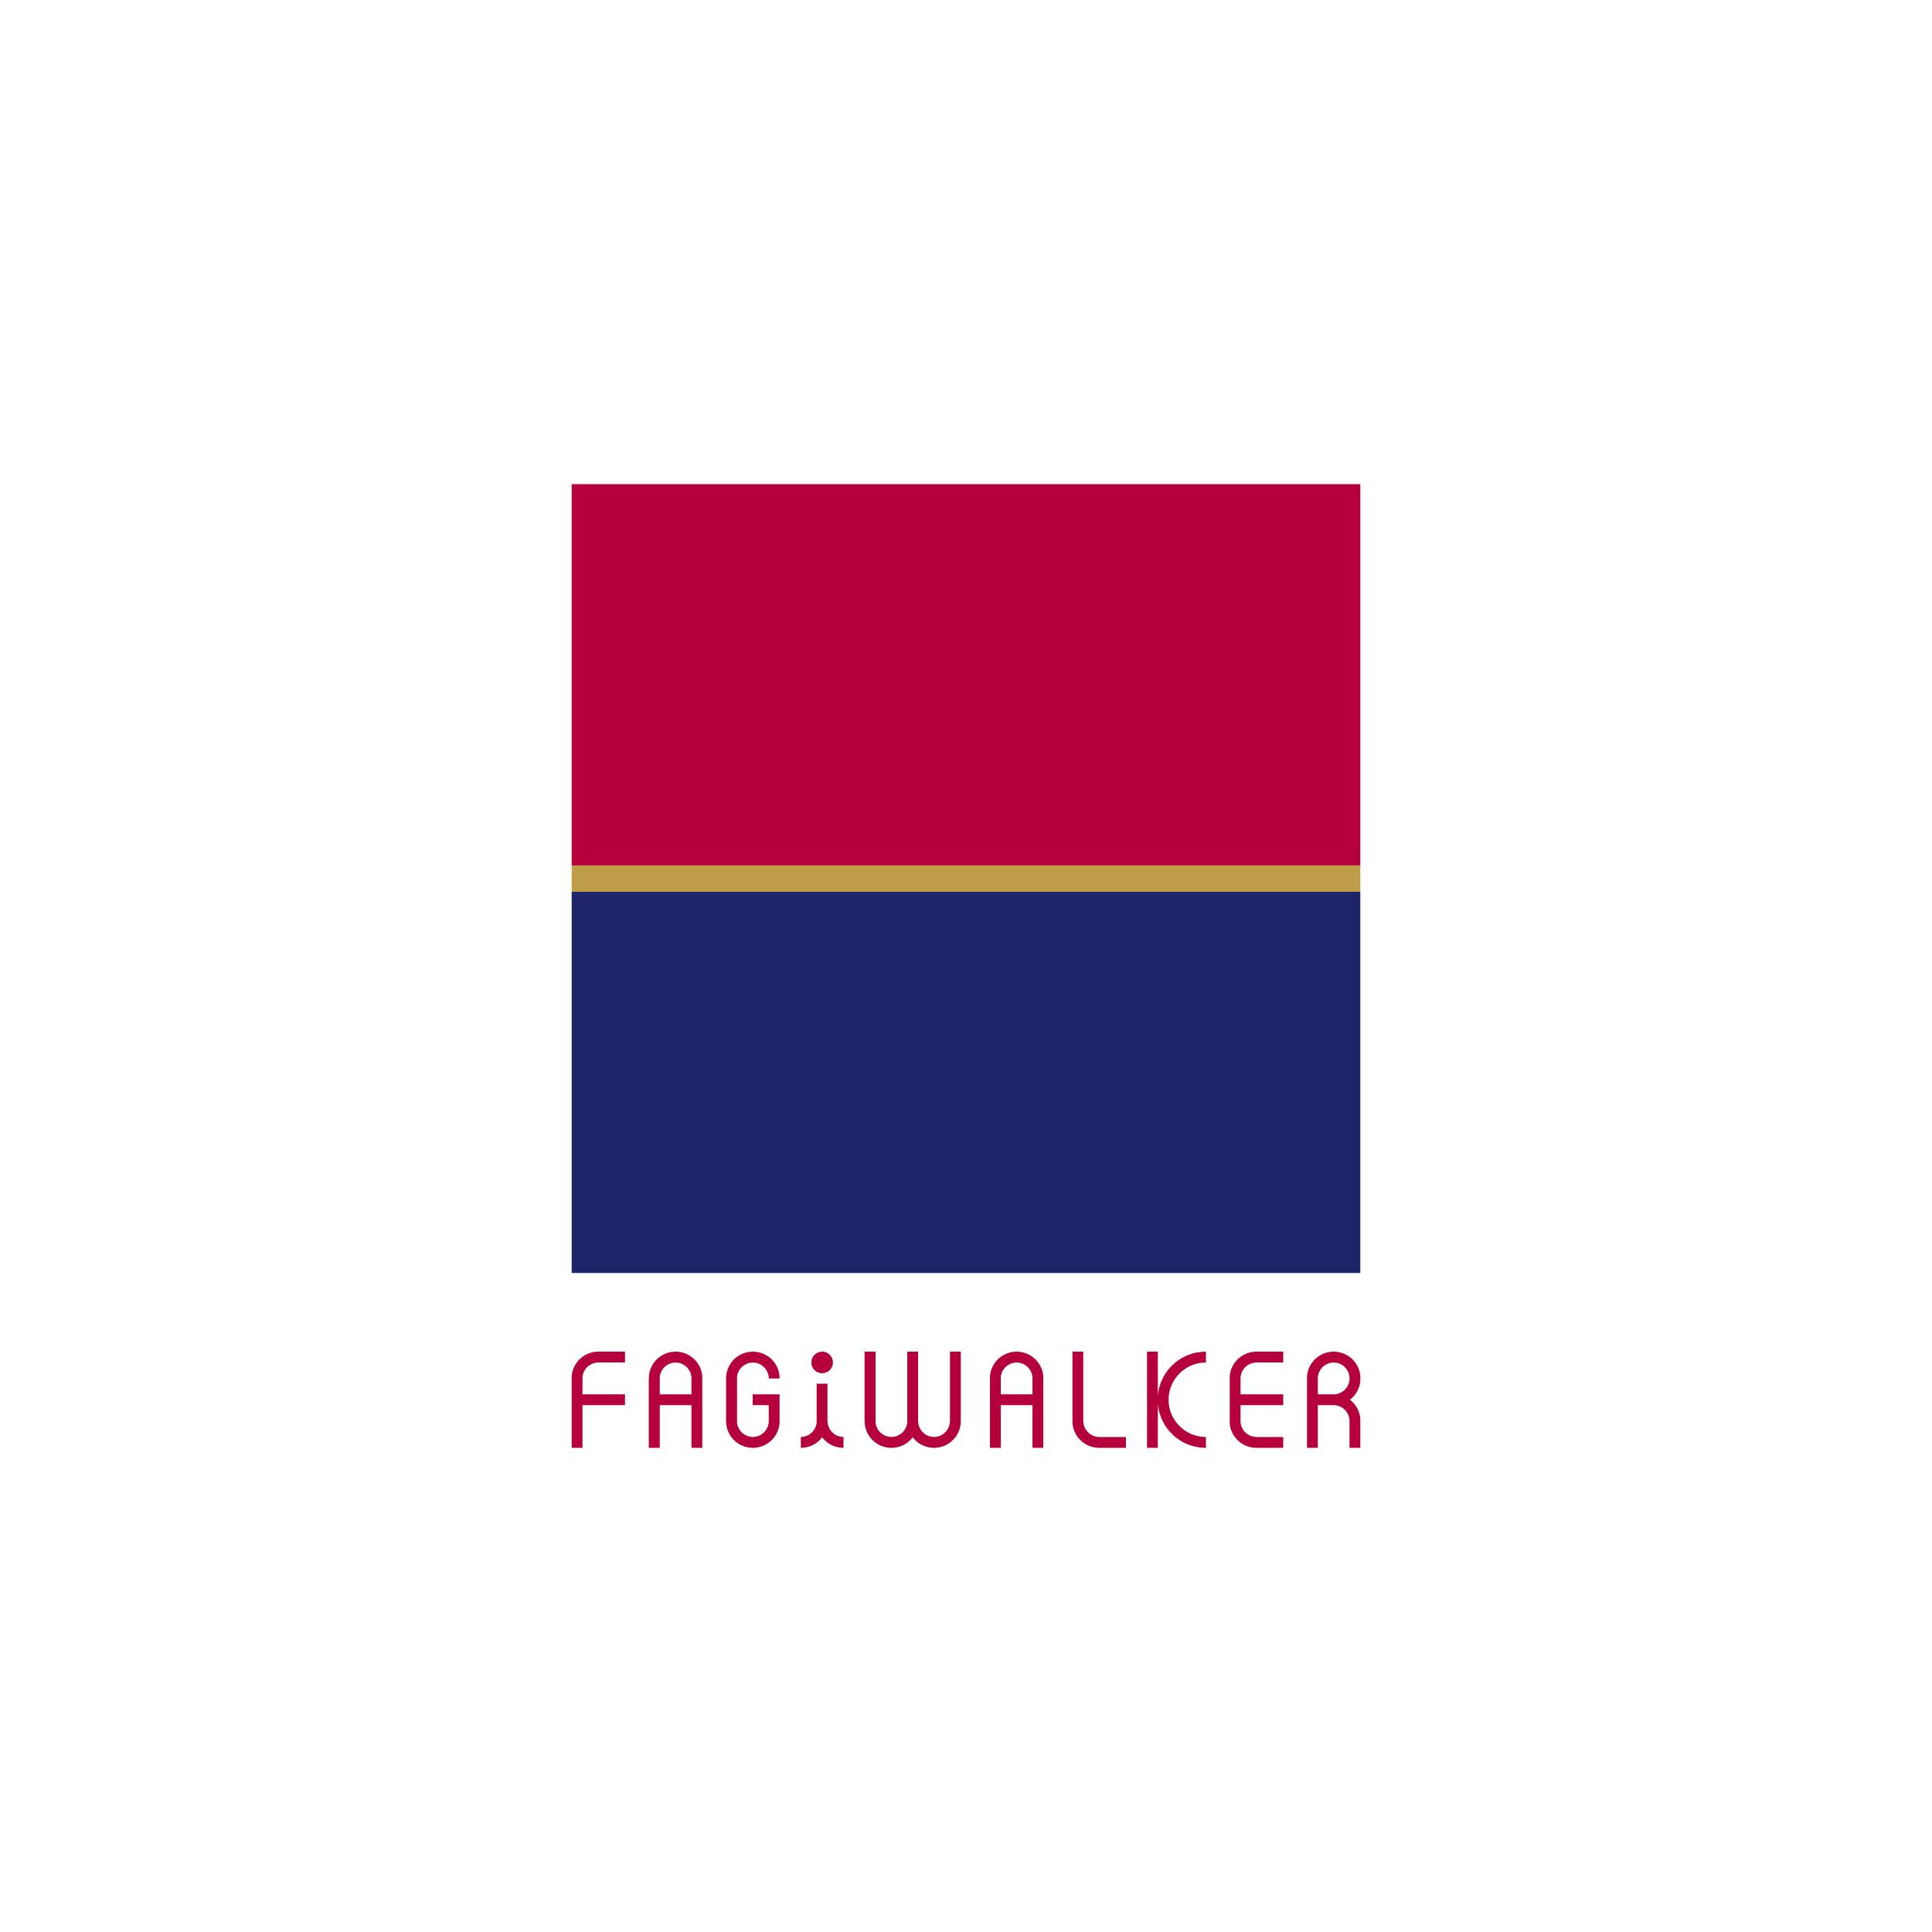 fagiwalker_vi_3